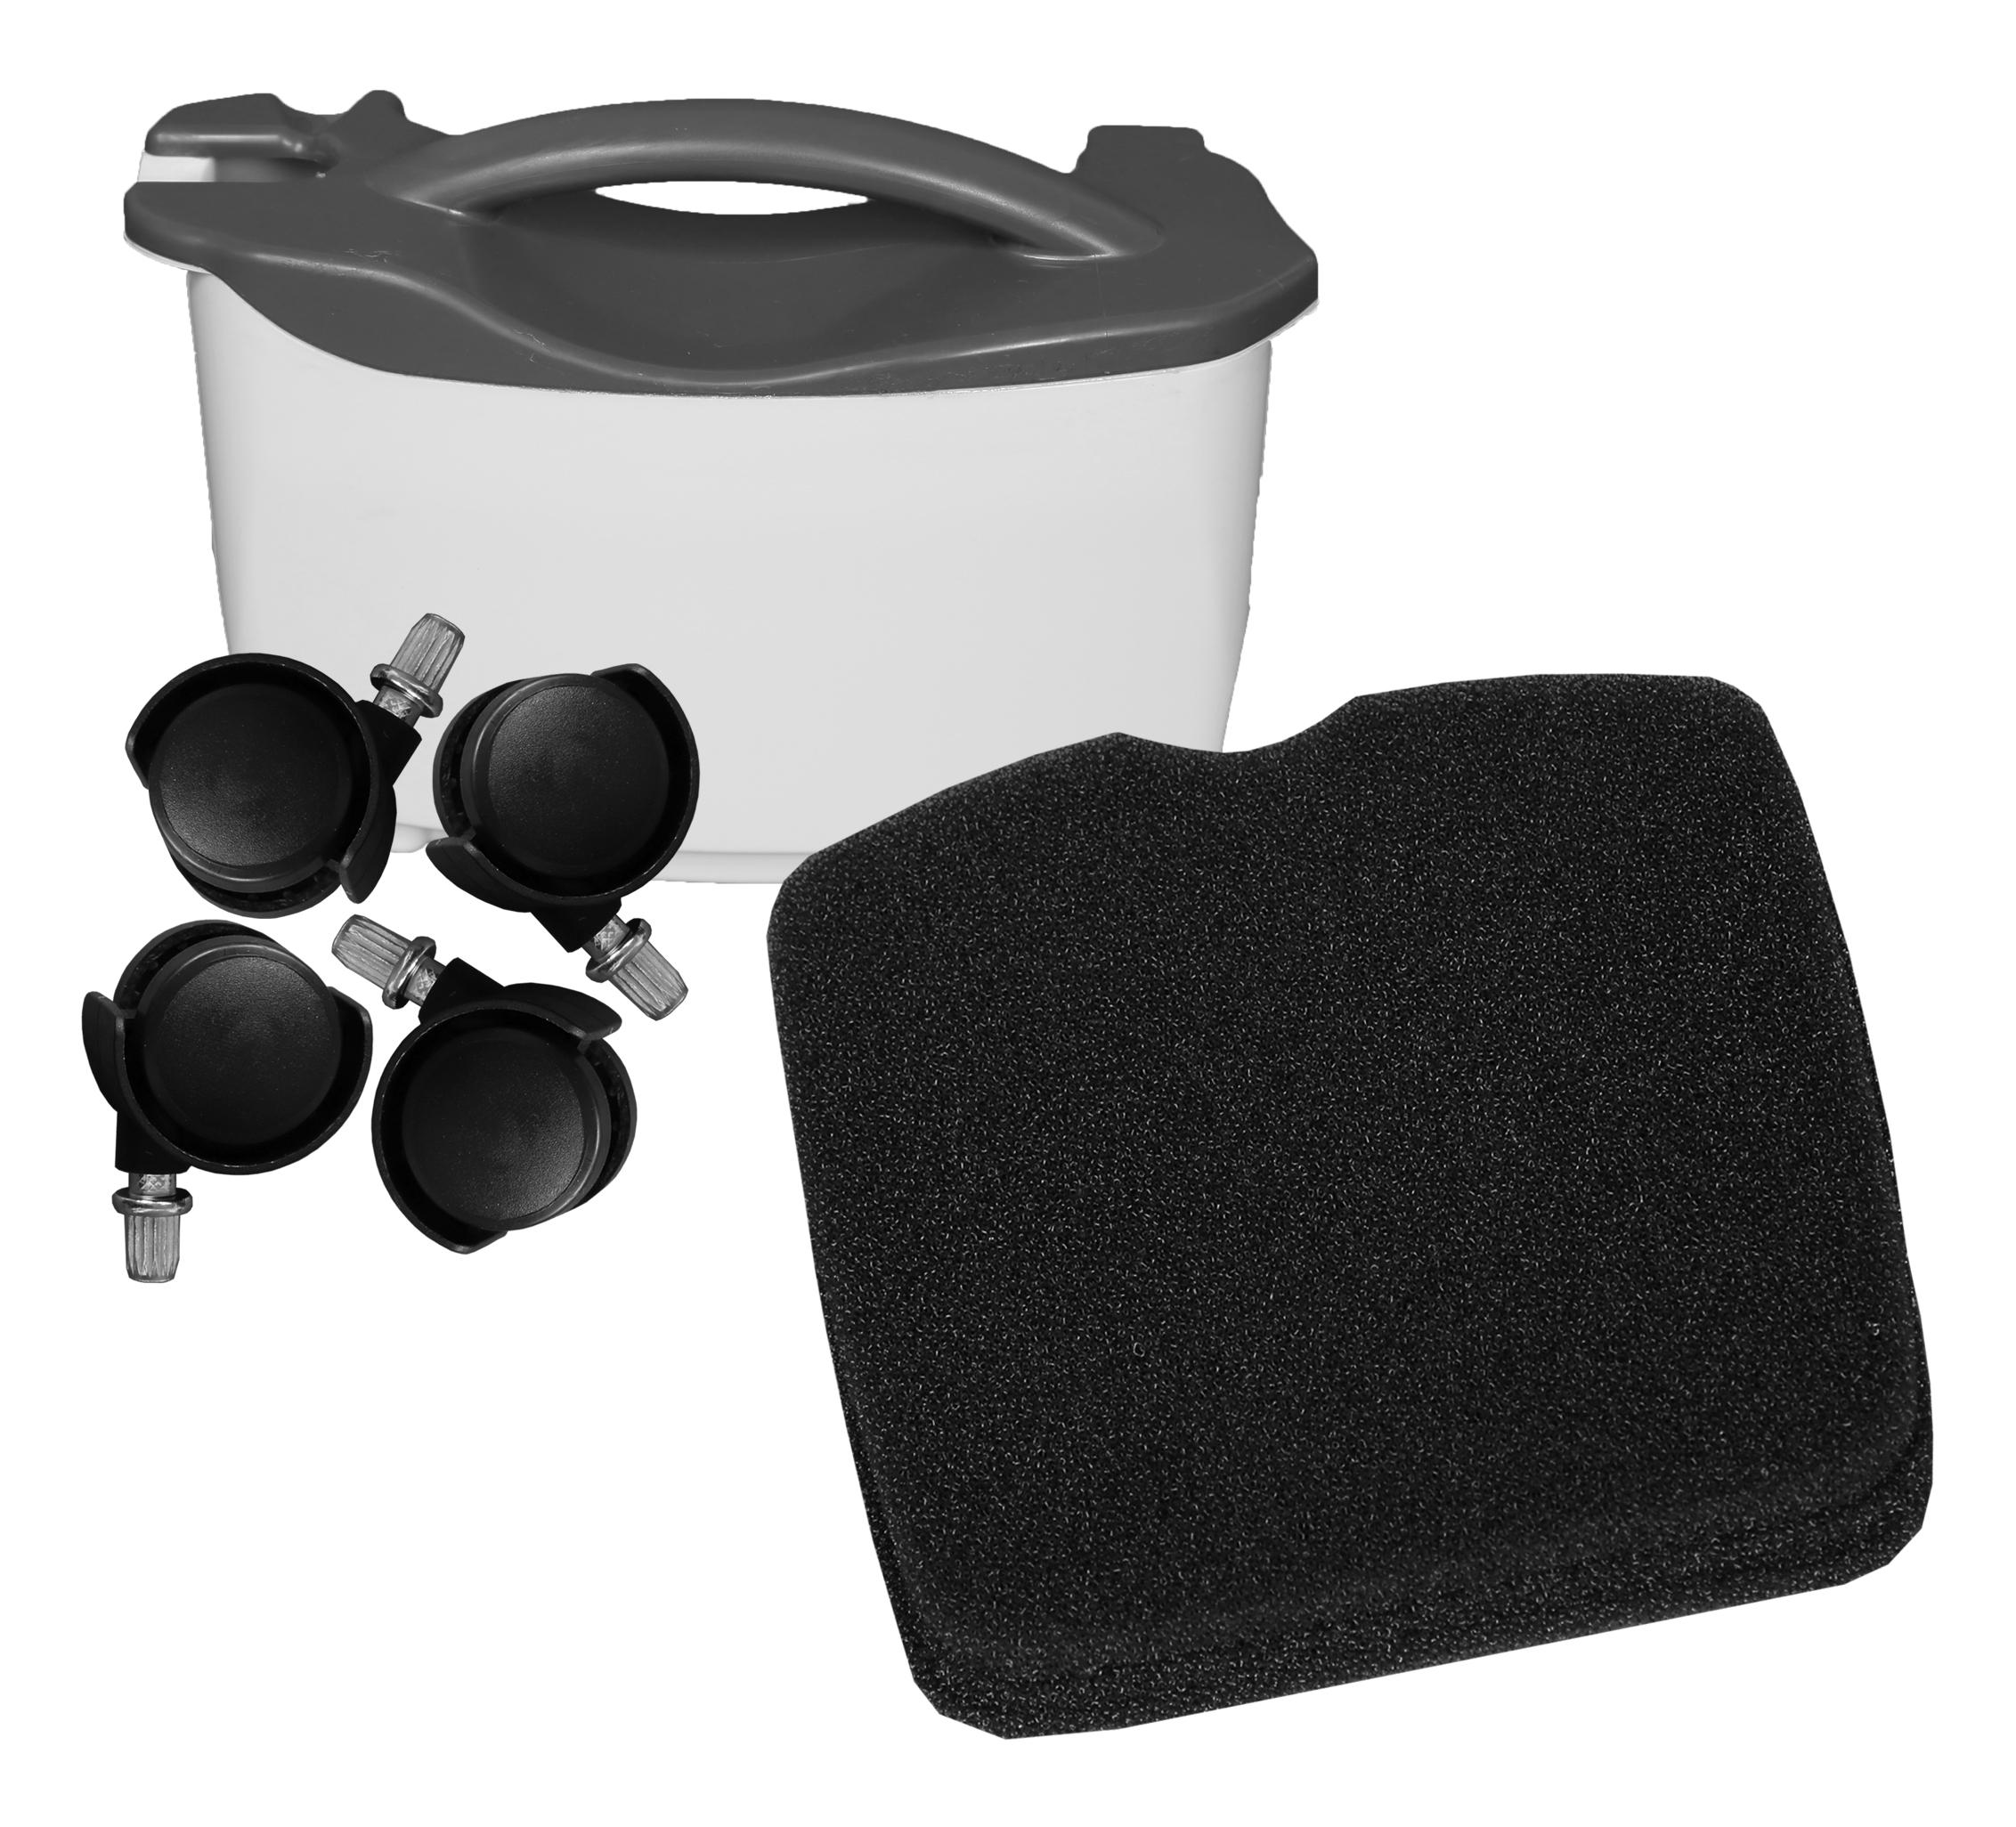 series (3850E) Dehumidifier 21 Litre: Amazon.co.uk: Kitchen & Home #666666